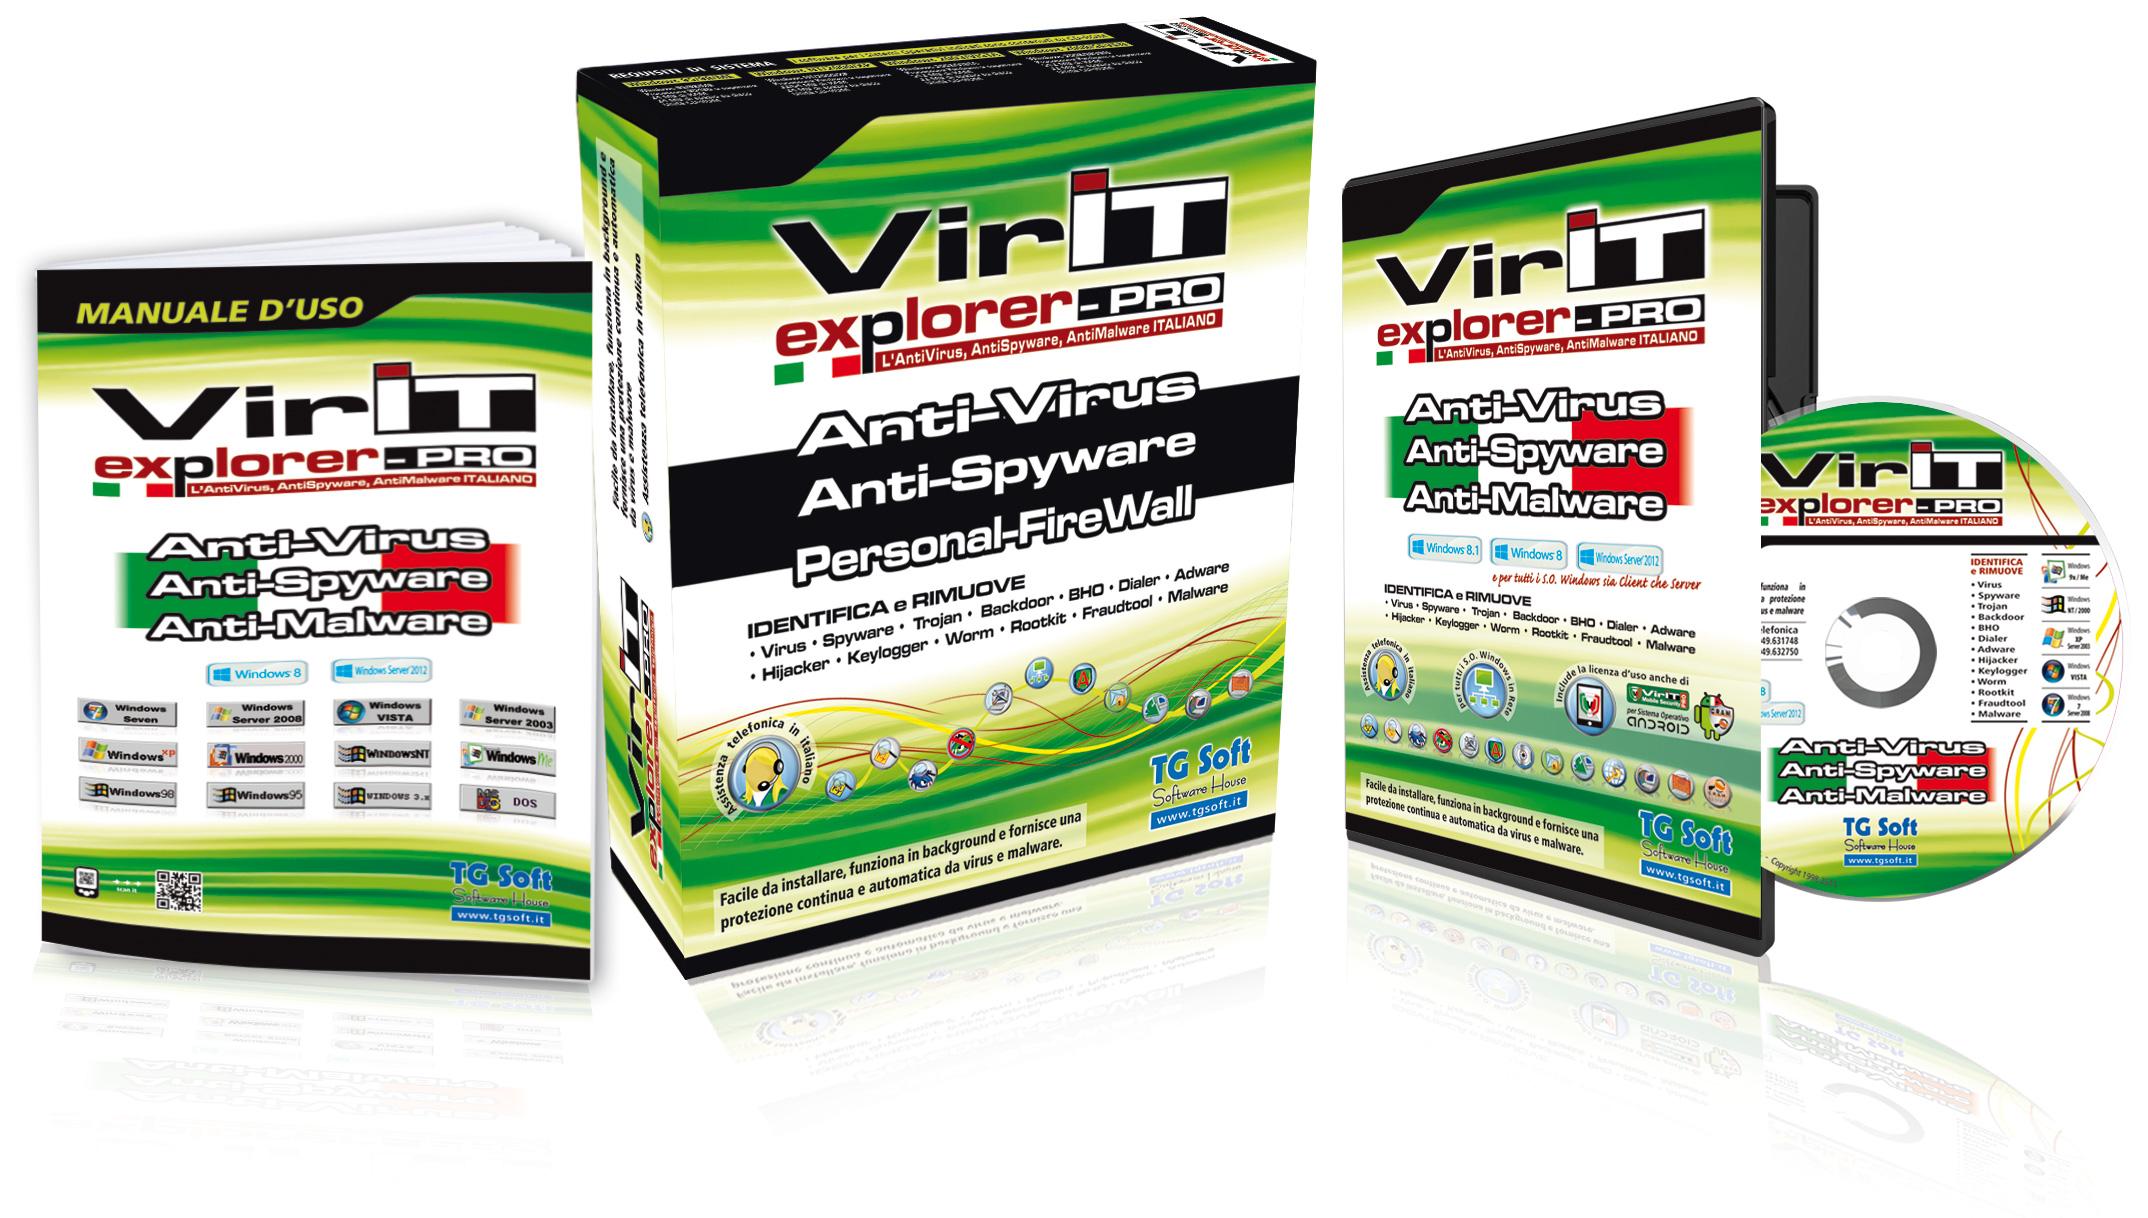 Antivirus Vir.it